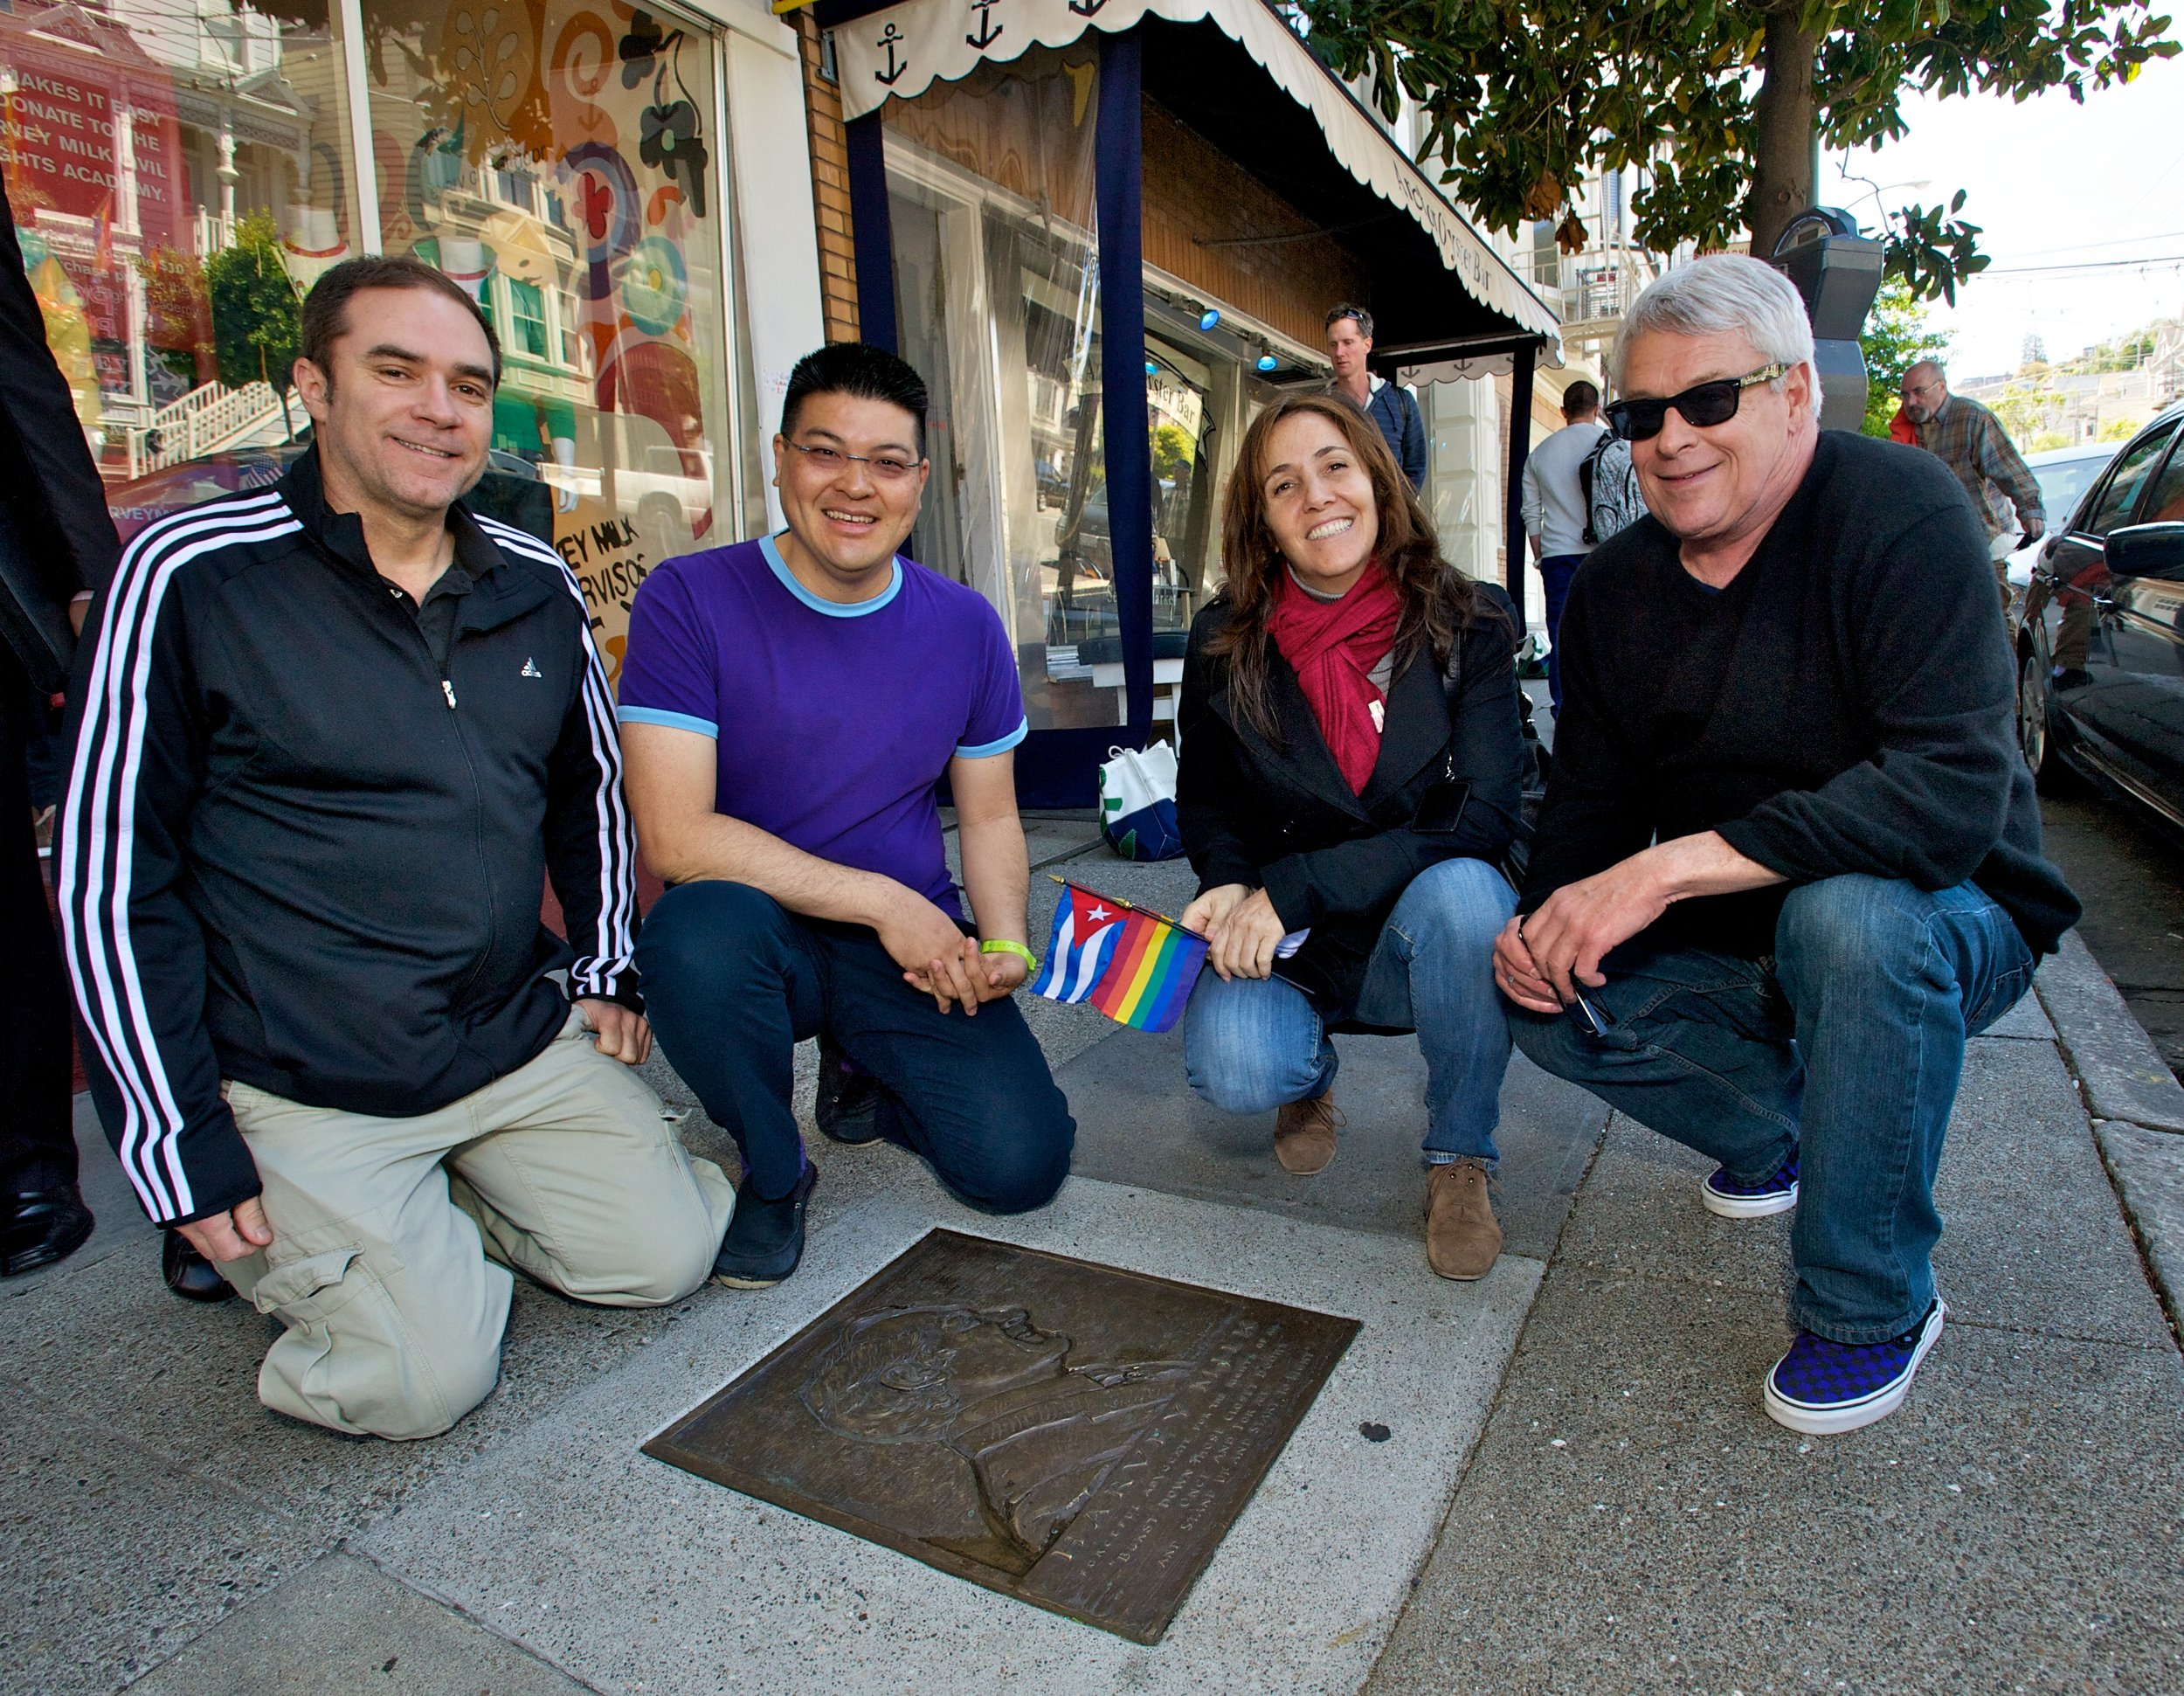 Jeff Cotter, Daniel Bao, Mariela Castro and Cleve Jones visit the Harvey Milk plaque on the Rainbow Honor Walk (2012)